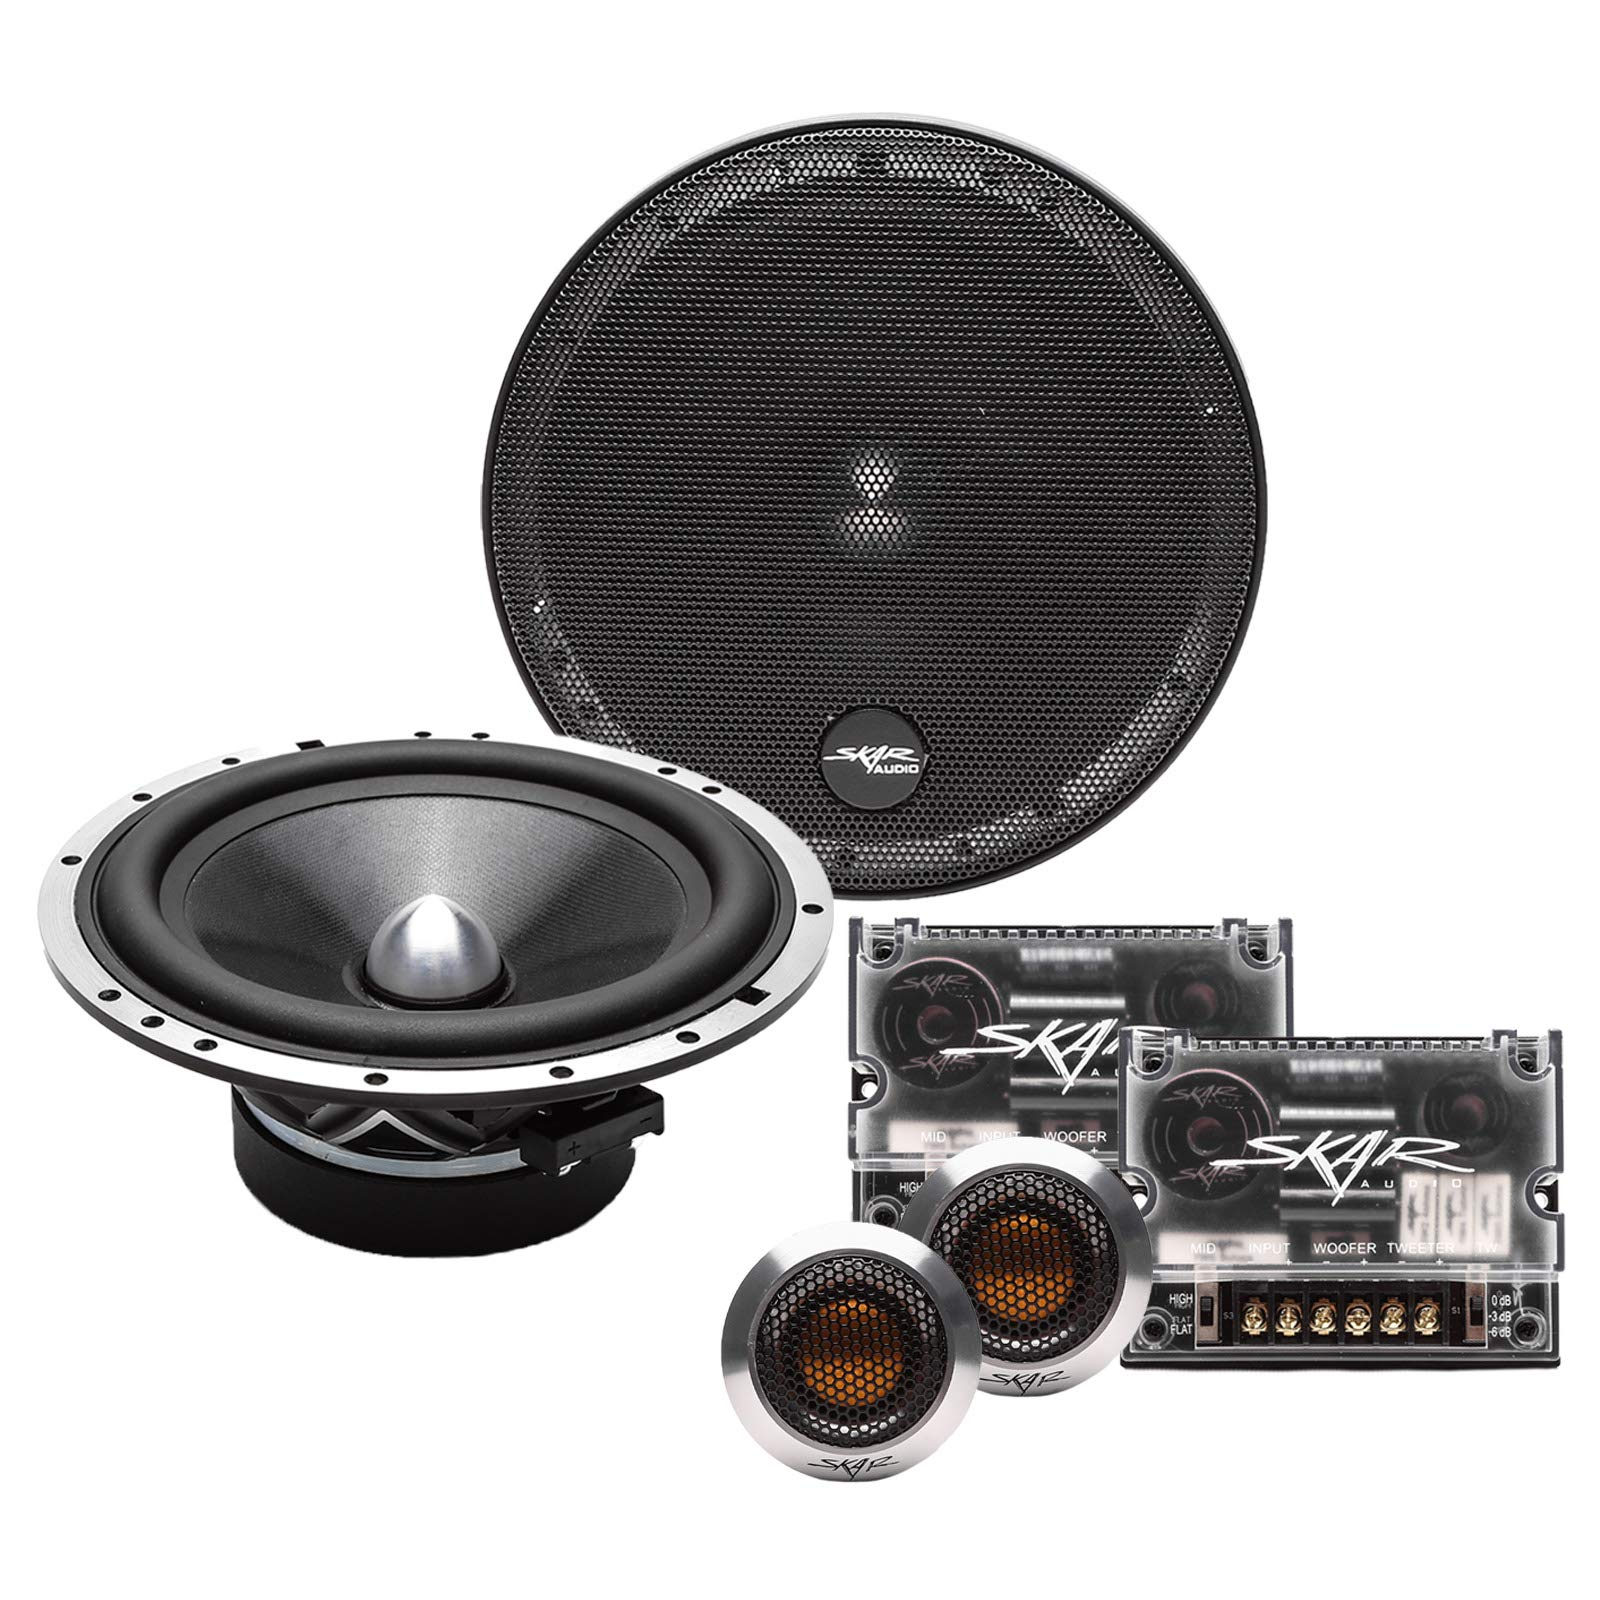 Skar Audio SPX-65C 6.5'' 2-Way High Performance Component Speaker System - Set of 2 by Skar Audio (Image #1)